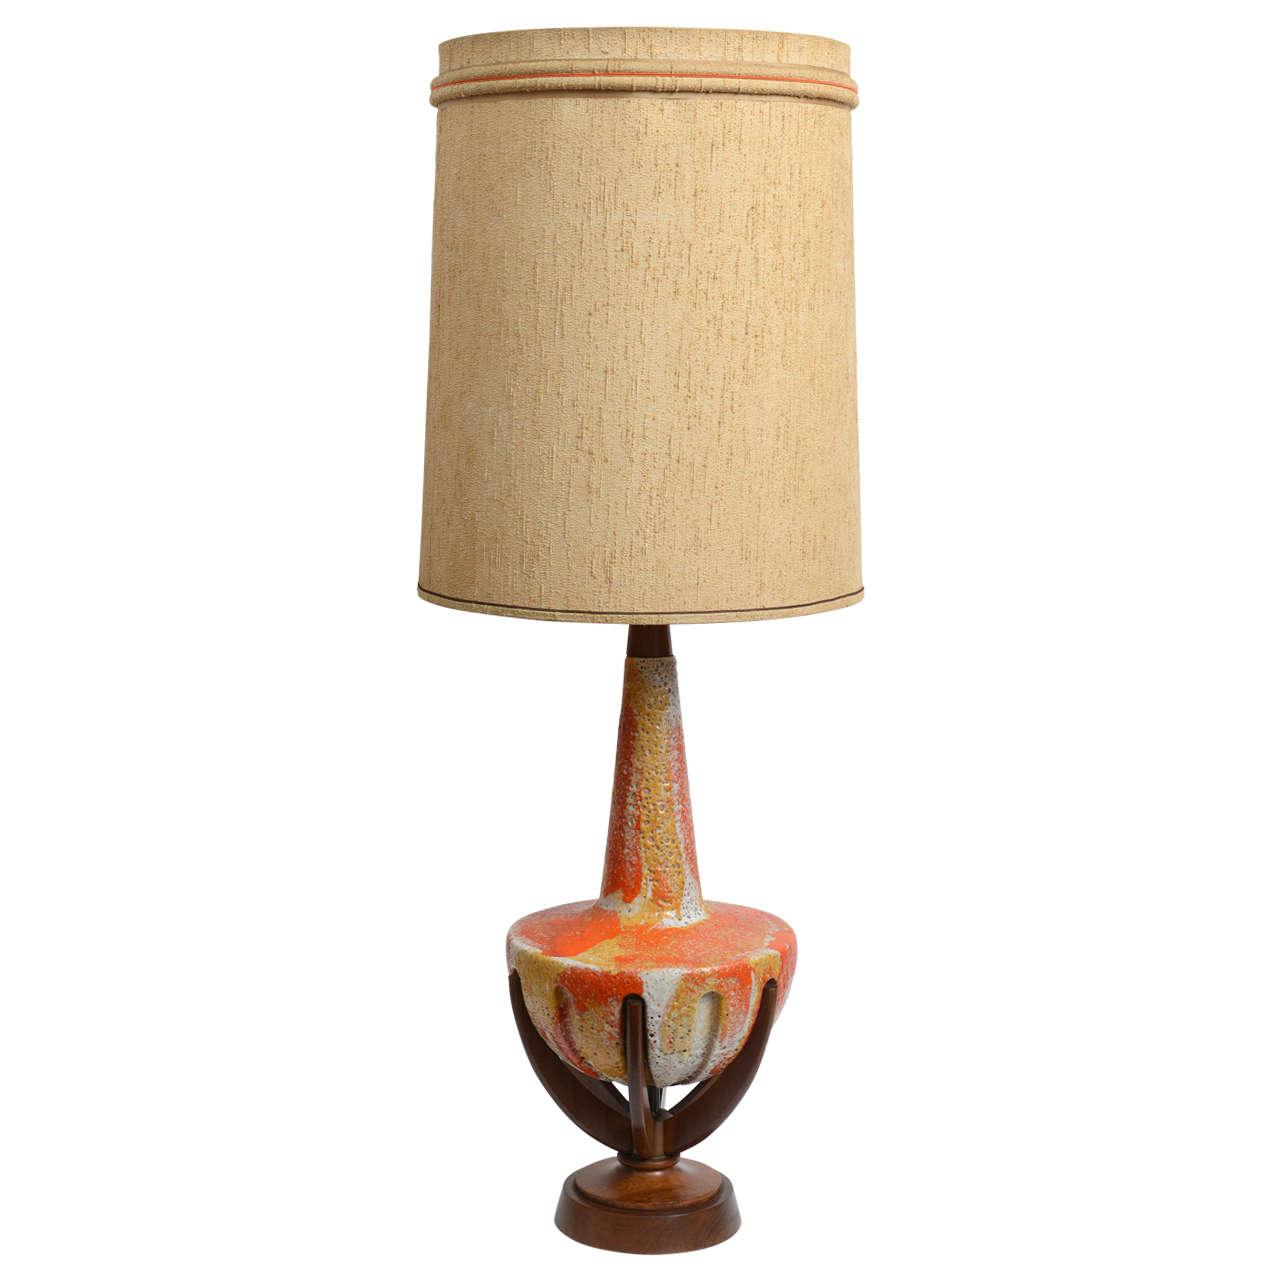 1960s Atomic Lava Ceramic Table Lamp on a Tripod Walnut